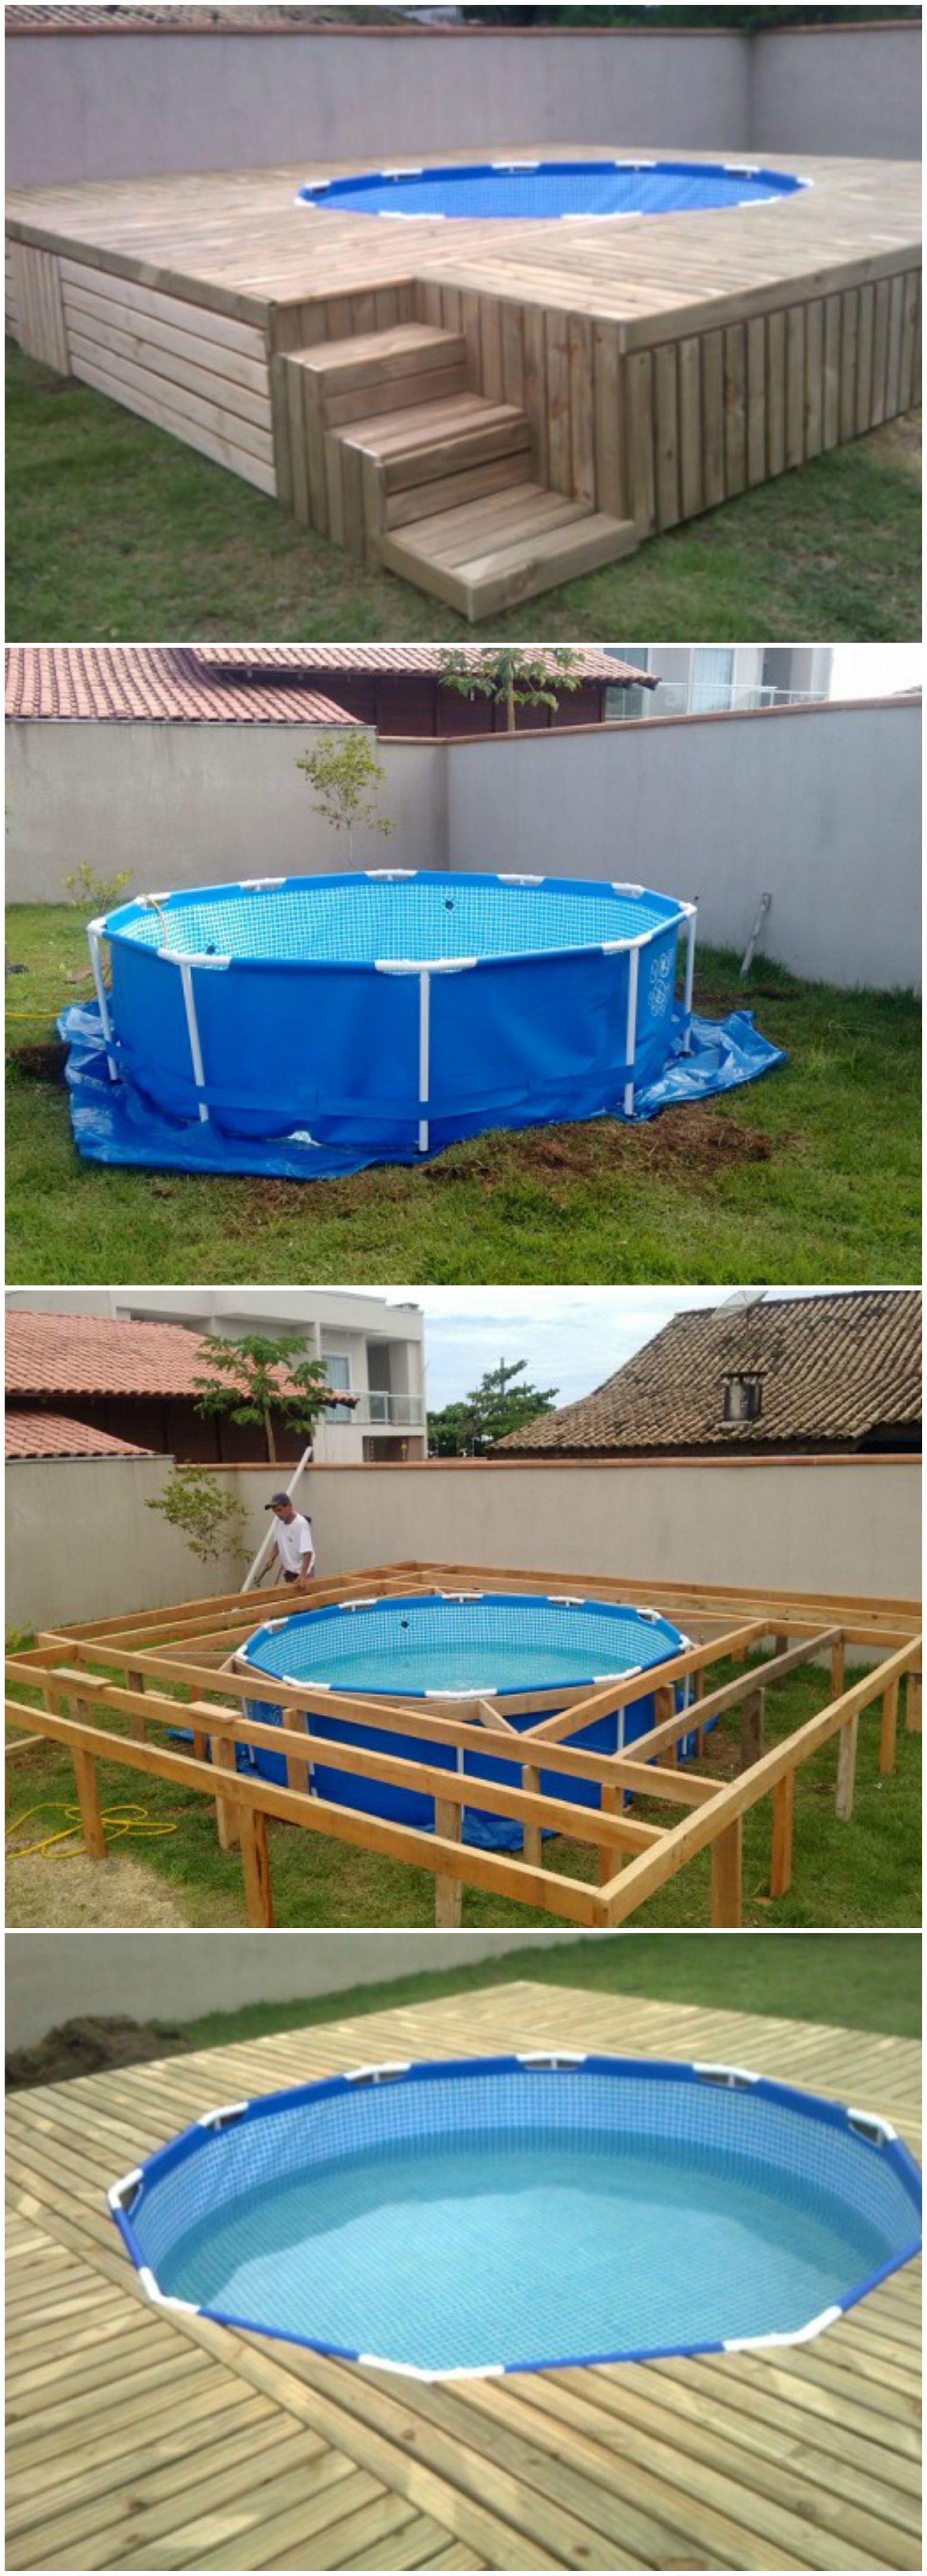 Budget Friendly Swimming Pool Deck Avec Images Amenagement Piscine Hors Sol